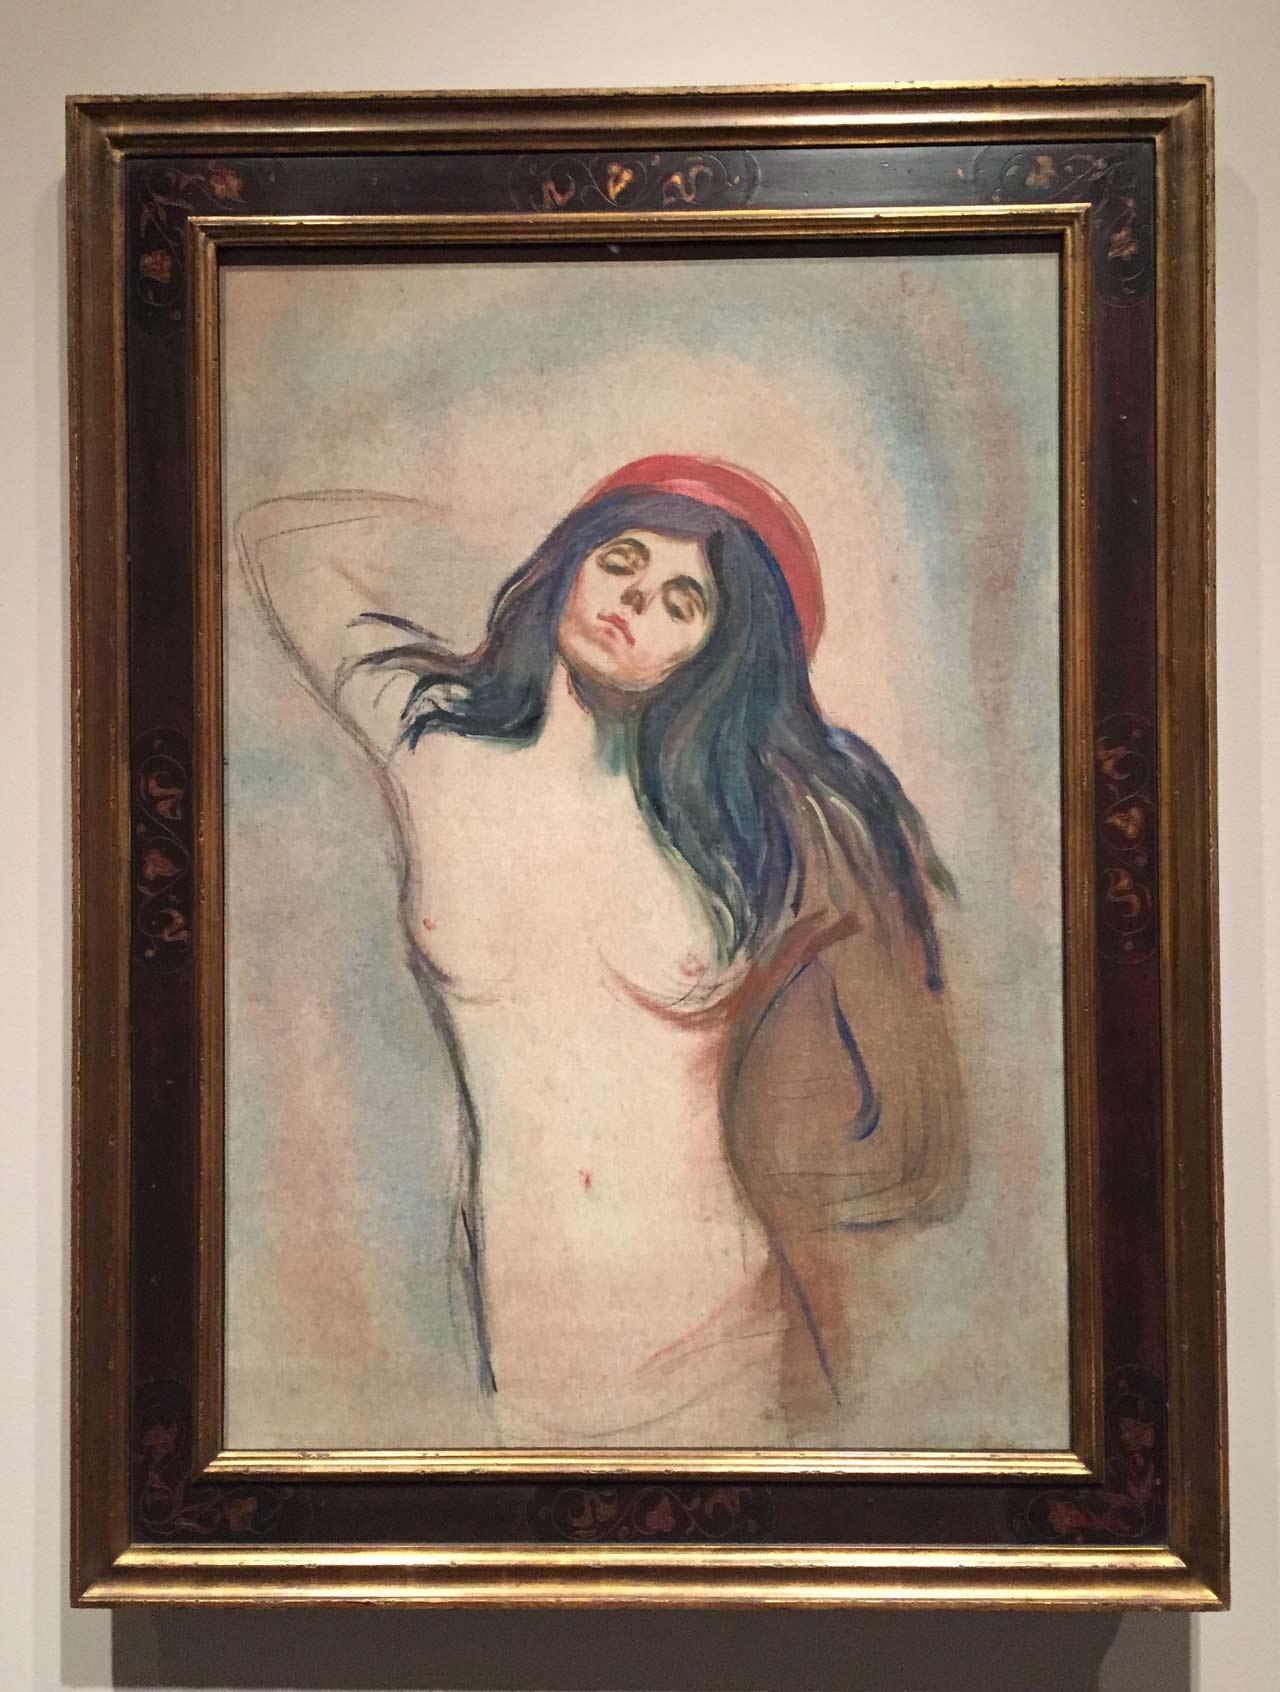 Edvard-Munch-Madonna-1895-97.jpg